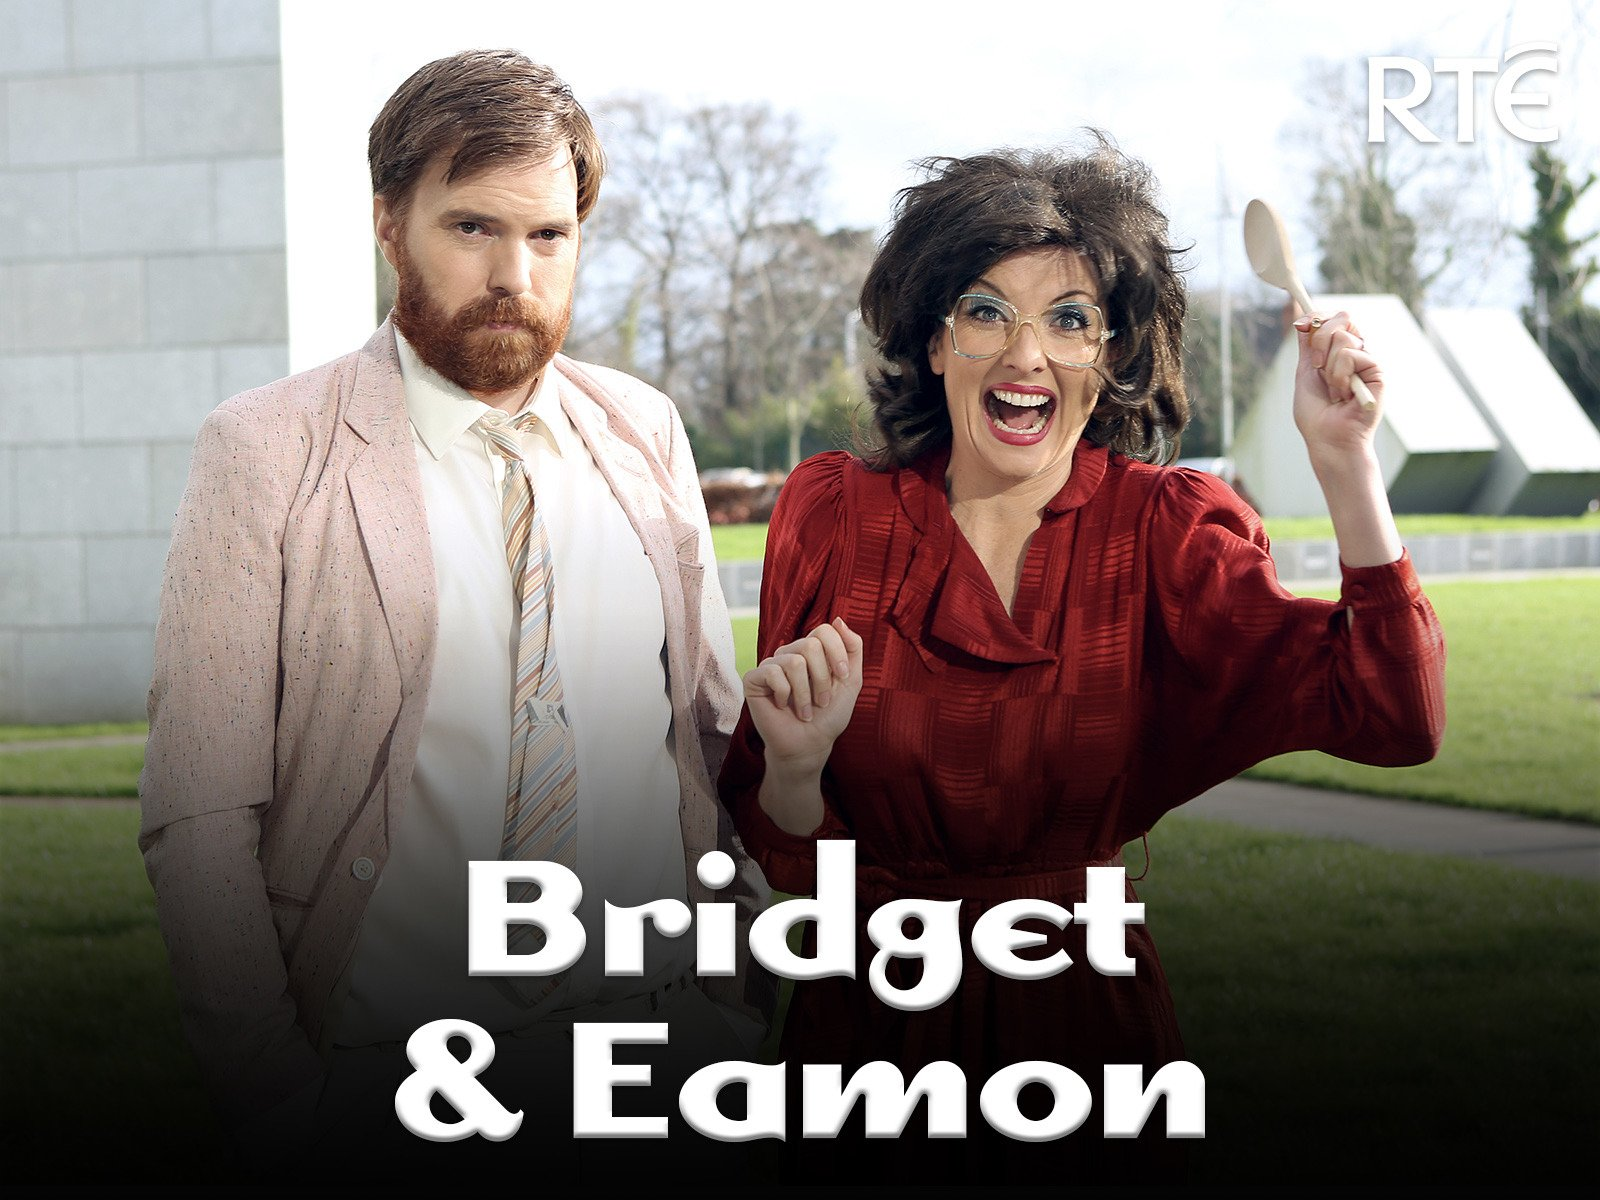 Bridget & Eamon - Season 2